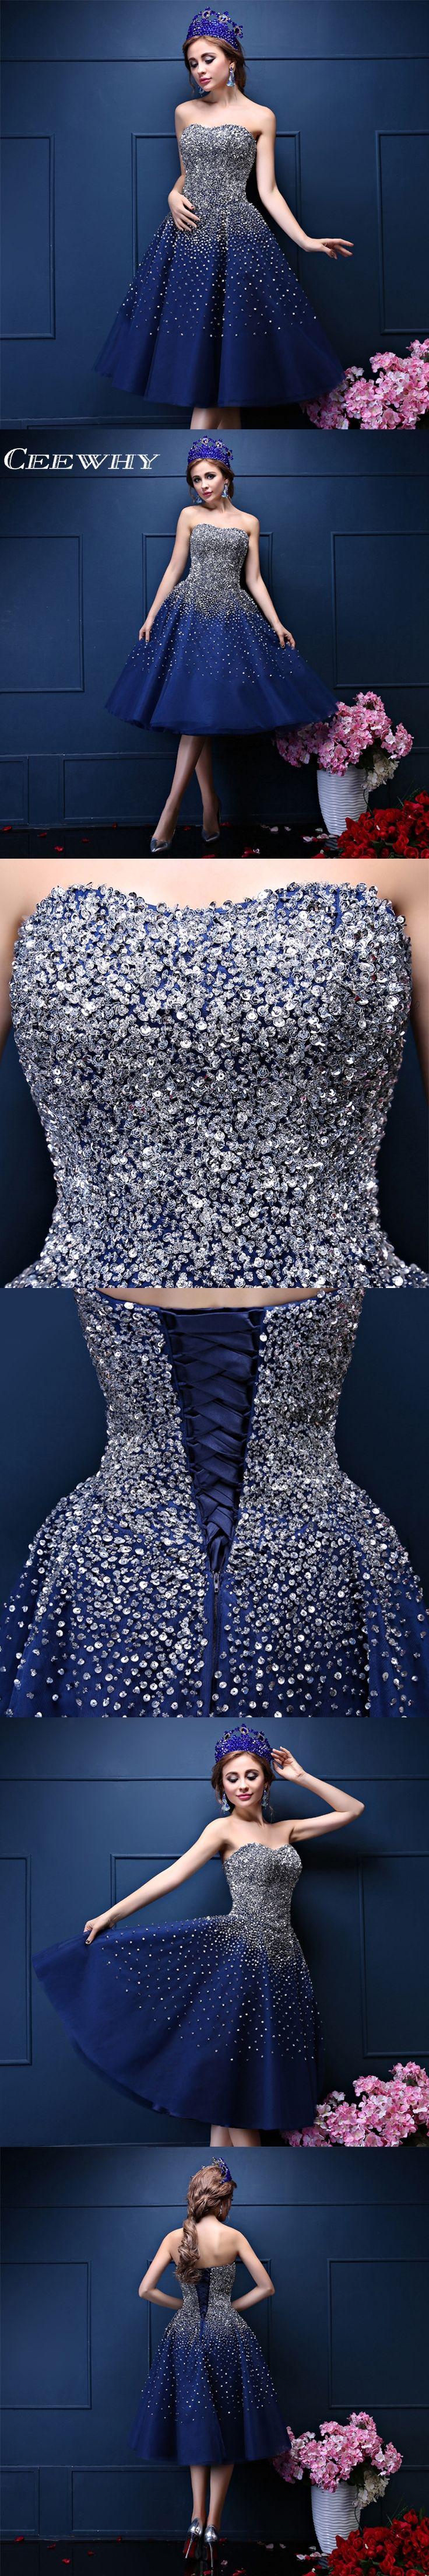 Custom Made Prom Dresses Organza Navy Blue Sweetheart Major Beading Tea-Length Formal Dresses Strapless Ball Gown Robe De